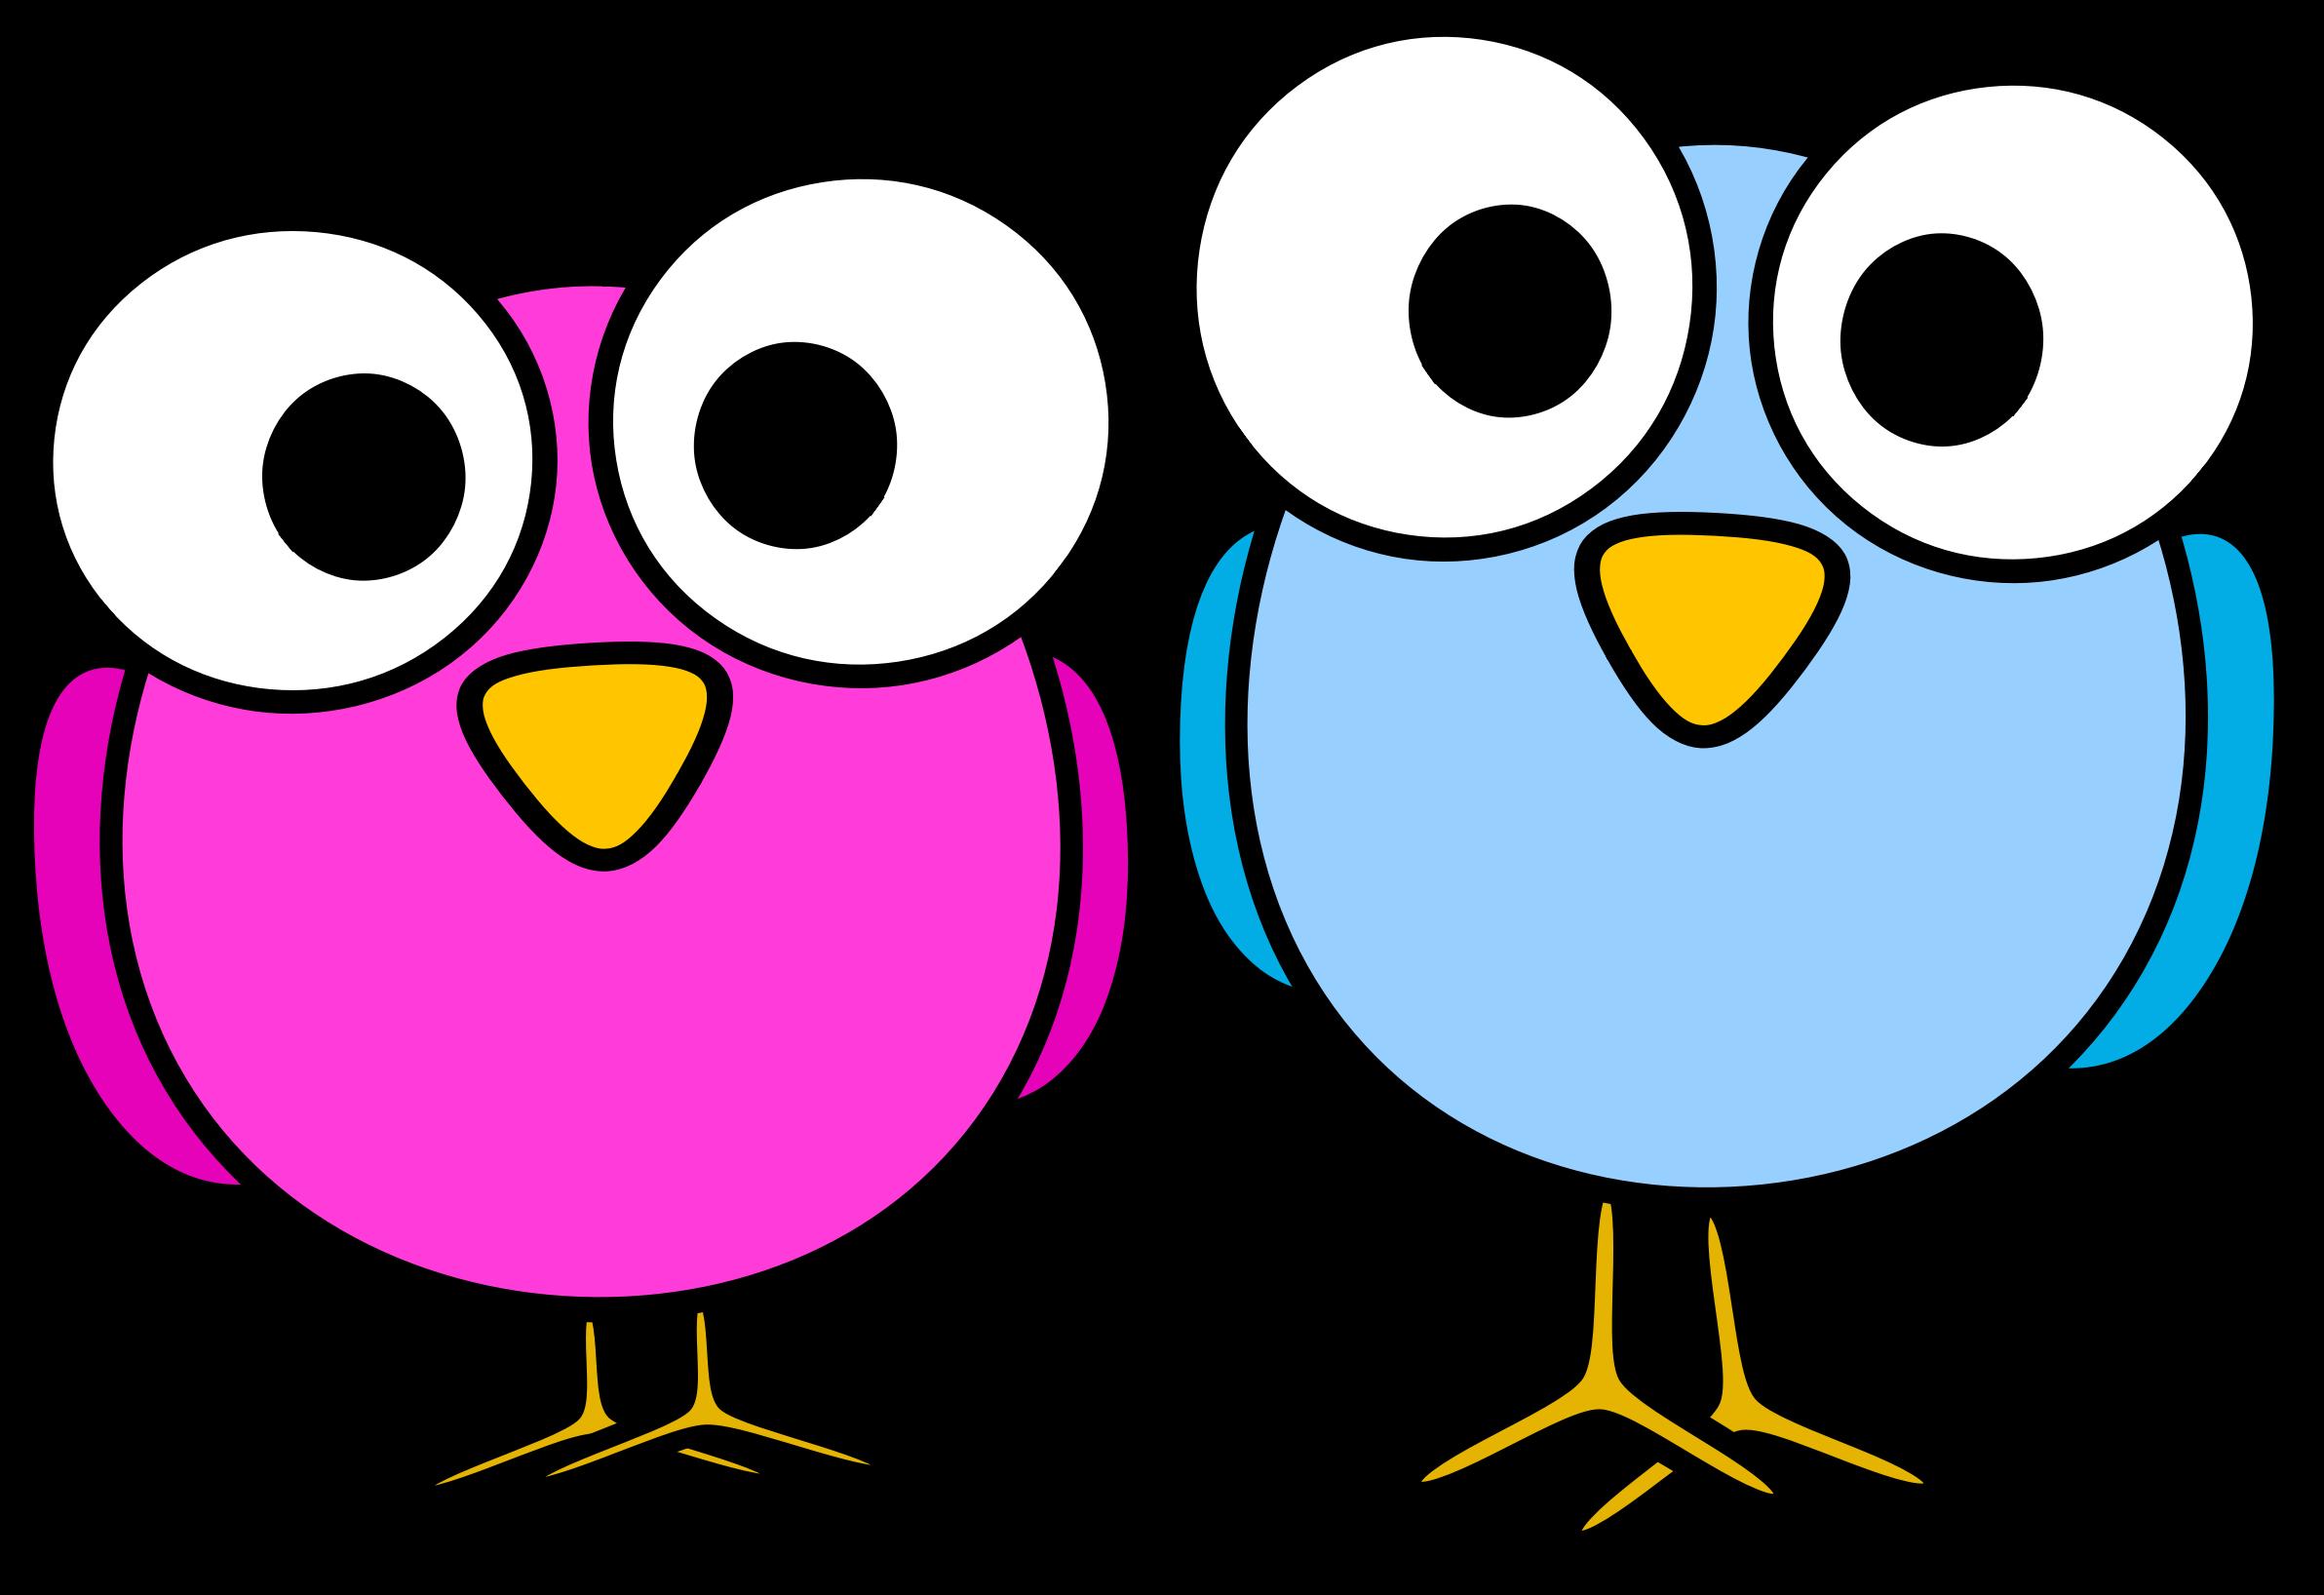 Cute cartoon animals with big eyes - Big Image Png